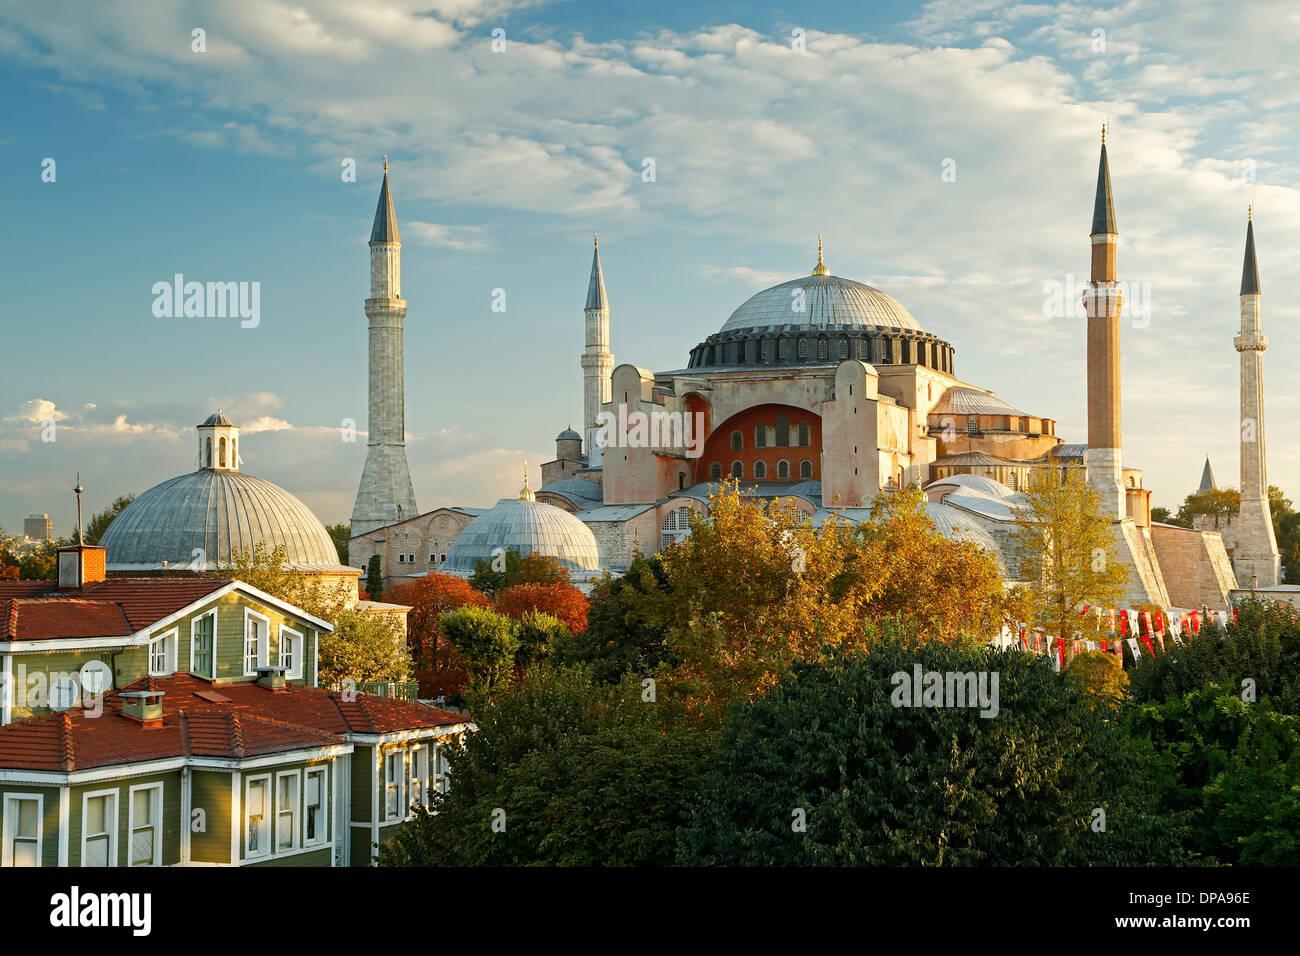 Hagia Sophia, Istanbul,Turkey - Stock Image